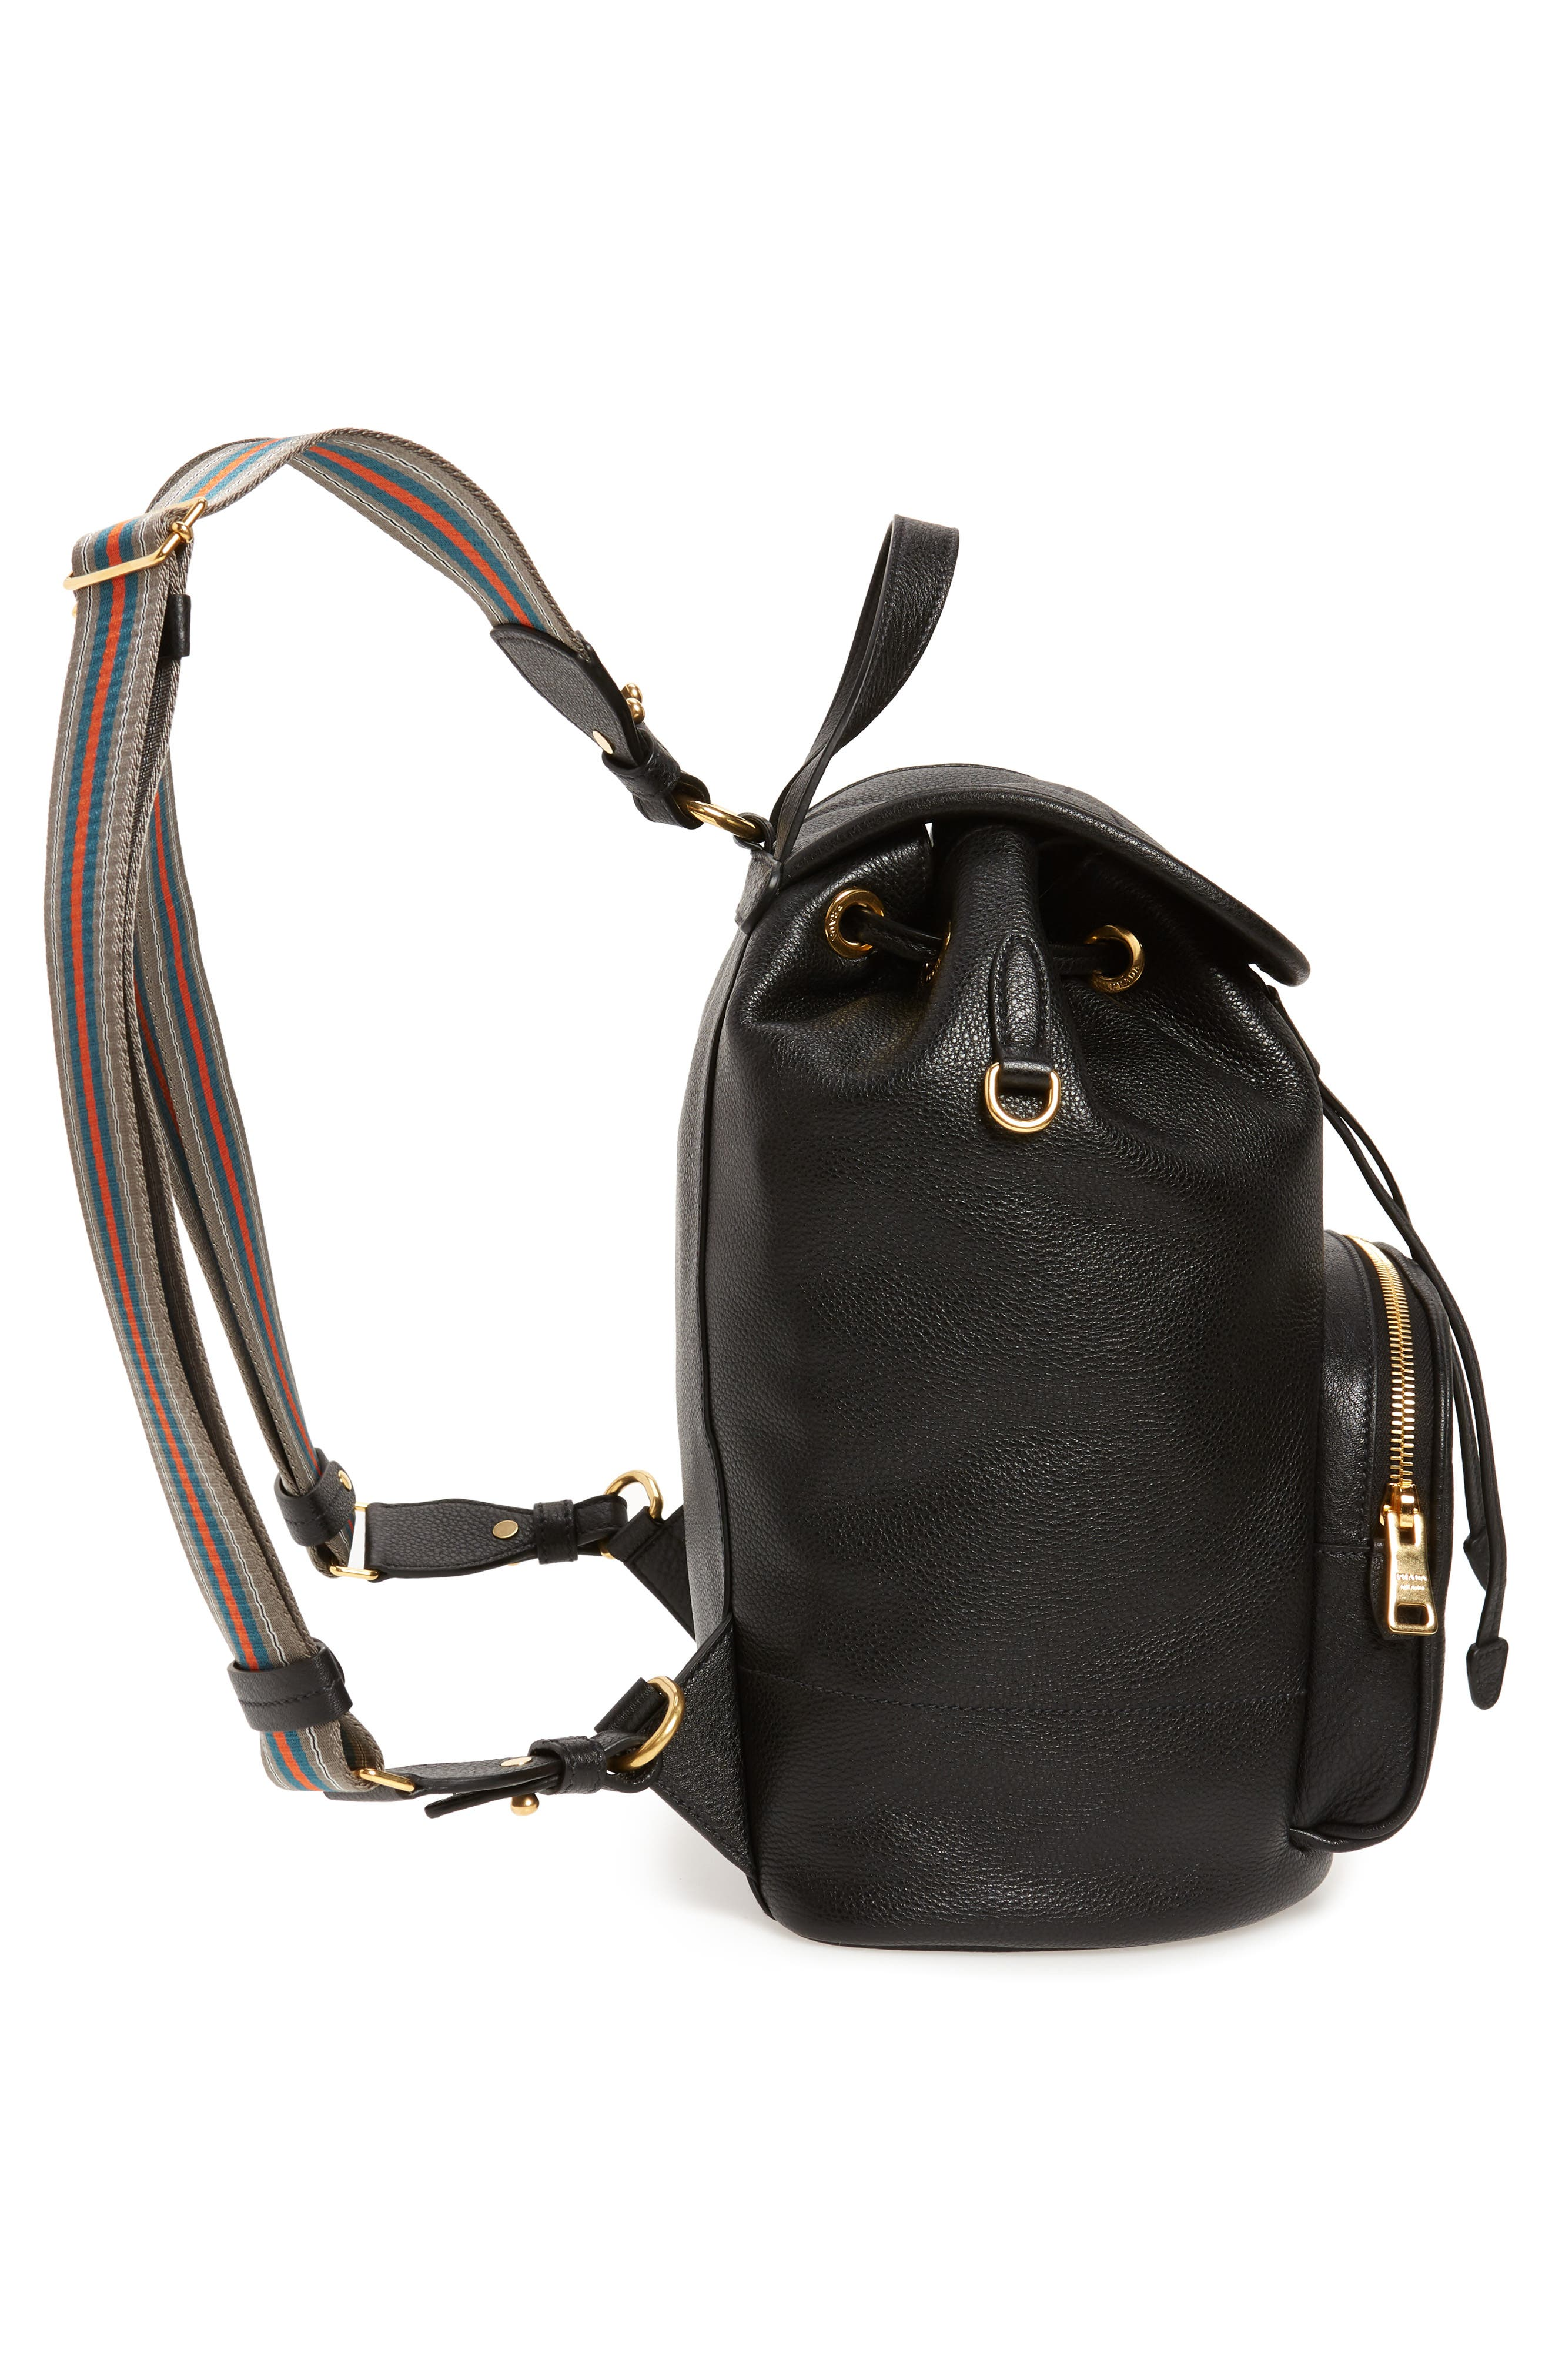 PRADA, Vitello Daino Pebbled Leather Backpack, Alternate thumbnail 6, color, 001